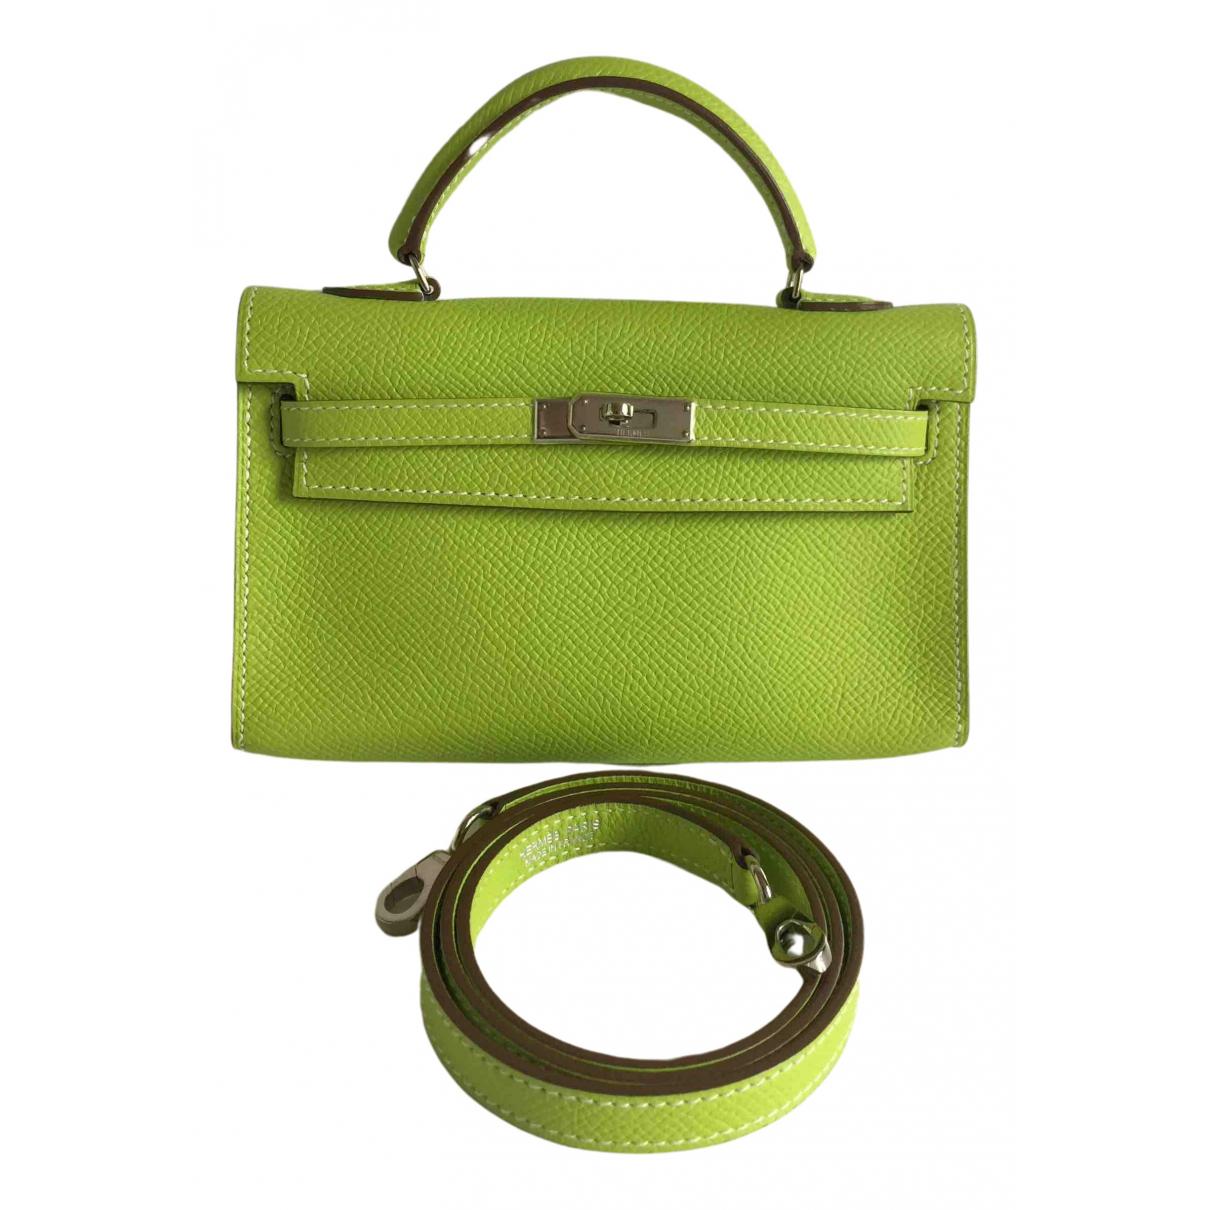 Hermès Kelly Tiny Green Leather handbag for Women N